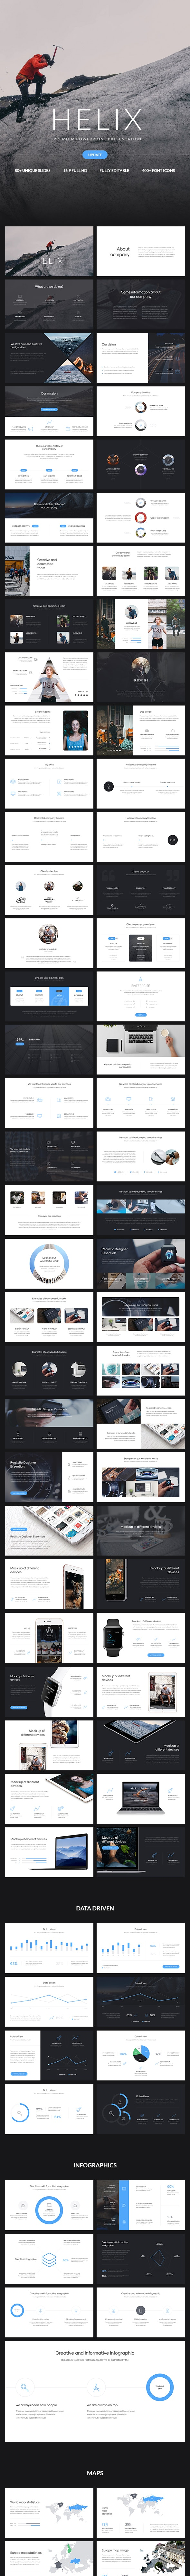 Helix PowerPoint Presentation - PowerPoint Templates Presentation Templates